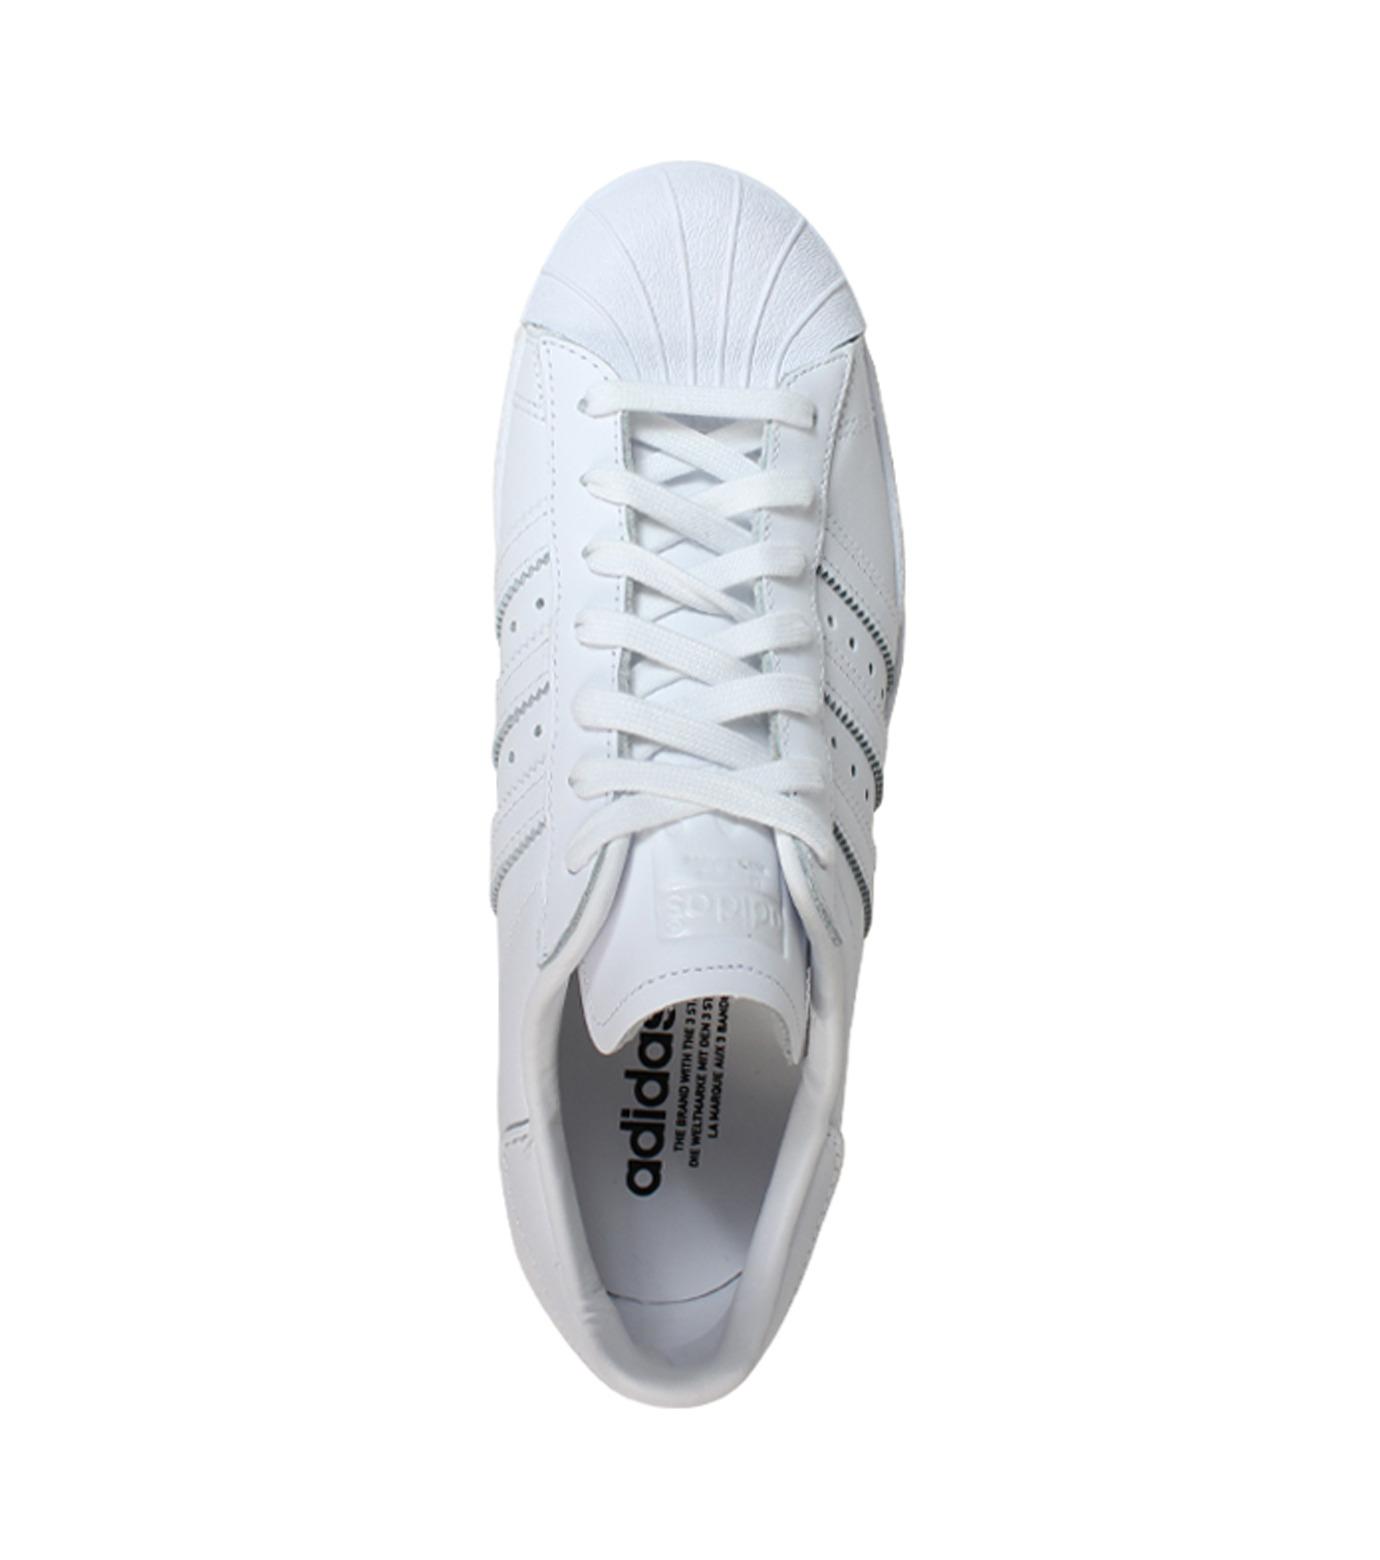 adidas(アディダス)のSUPERSTAR 80s-WHITE(シューズ/shoes)-S79443-4 拡大詳細画像3